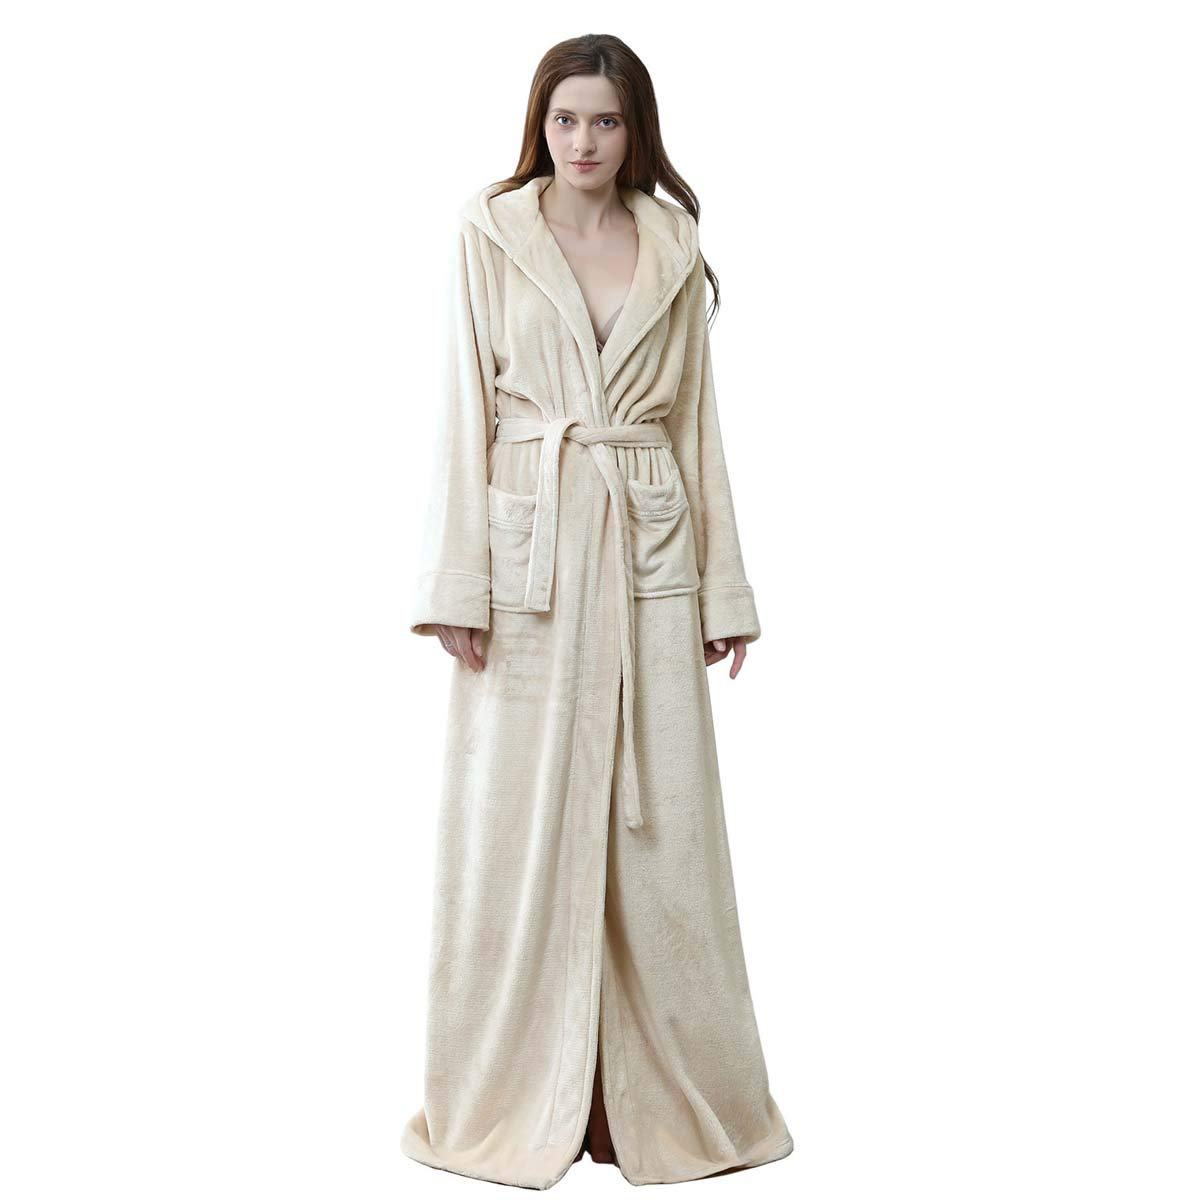 Amazon.com  Long Hooded Robe for Women Luxurious Flannel Fleece Full Length Bathrobe  Winter Warm Pajamas Shower Nightgown  Clothing 9f2d660d2